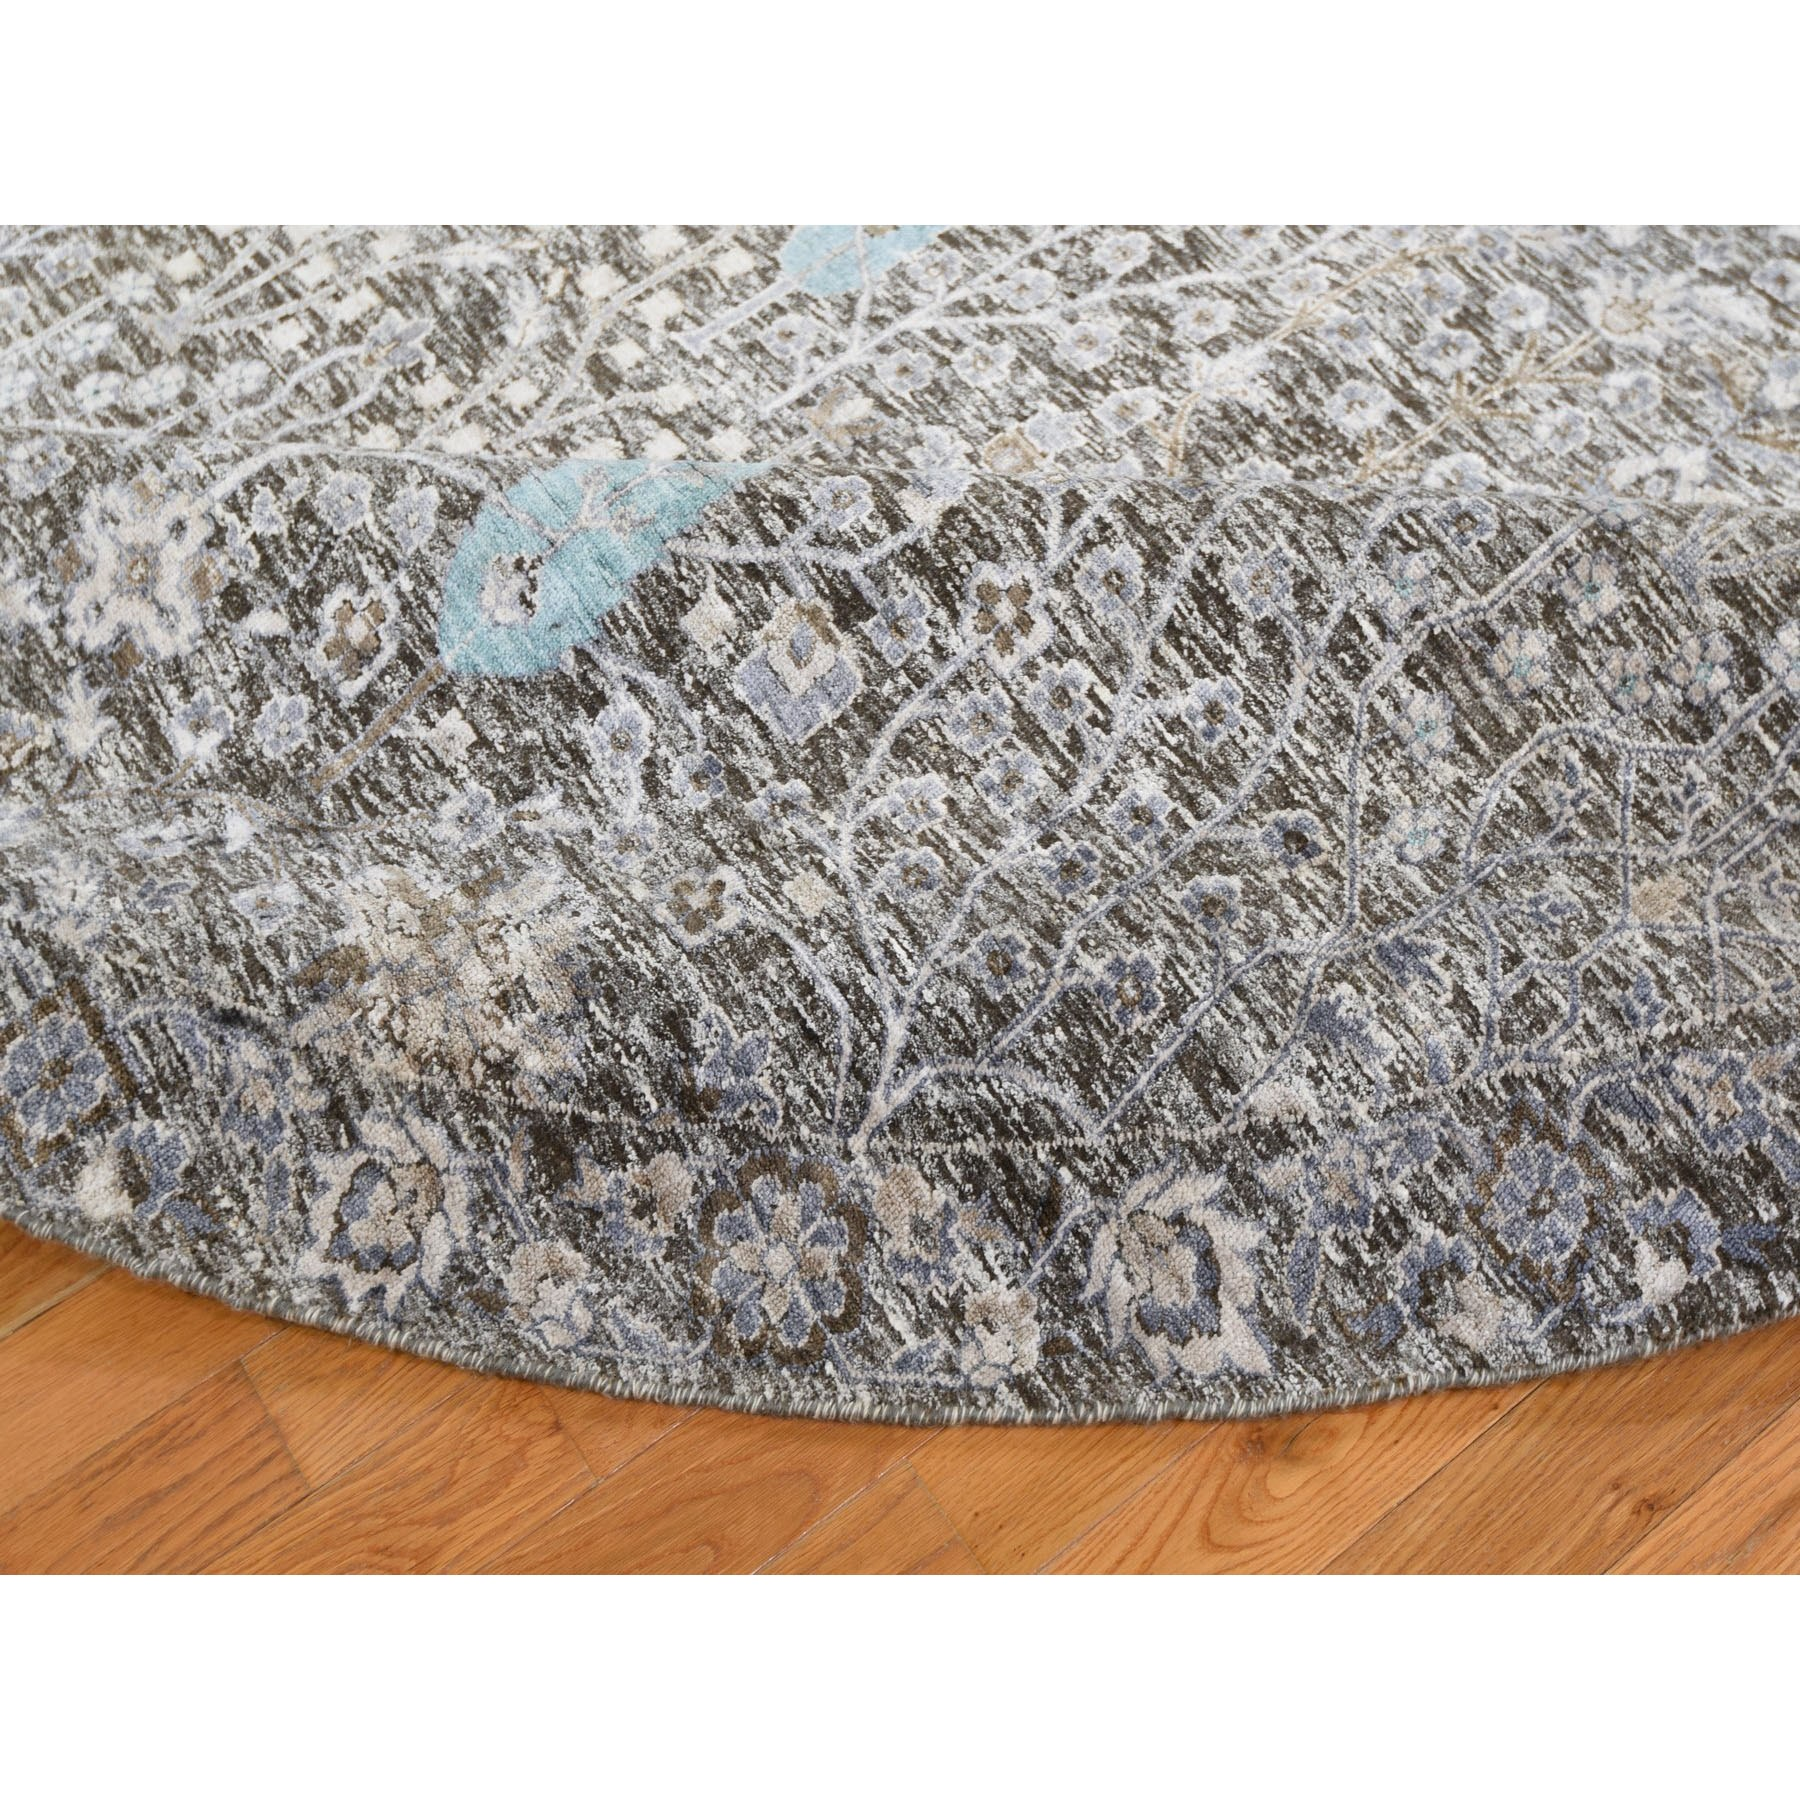 12-x12- Round Cypress Tree Design Silk with Textured Wool Hand Knotted Oriental Rug